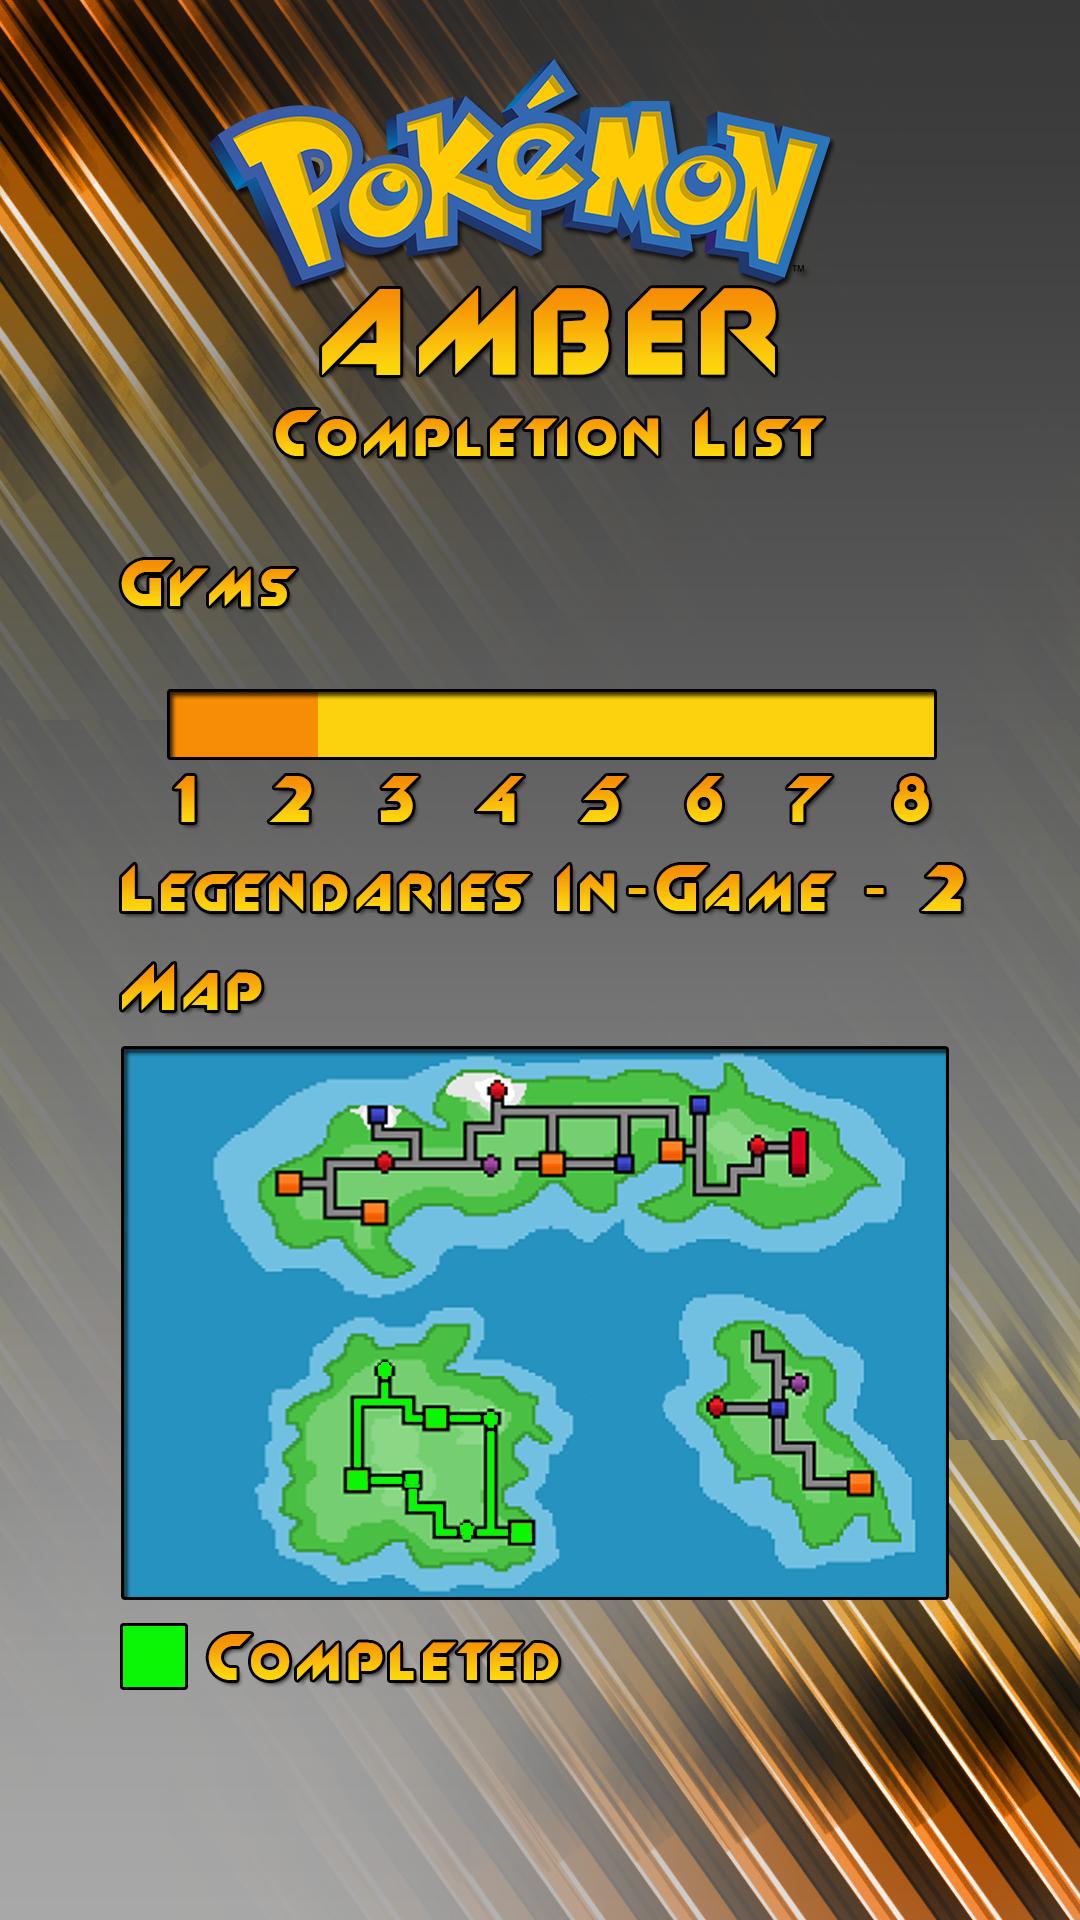 Completion listV2